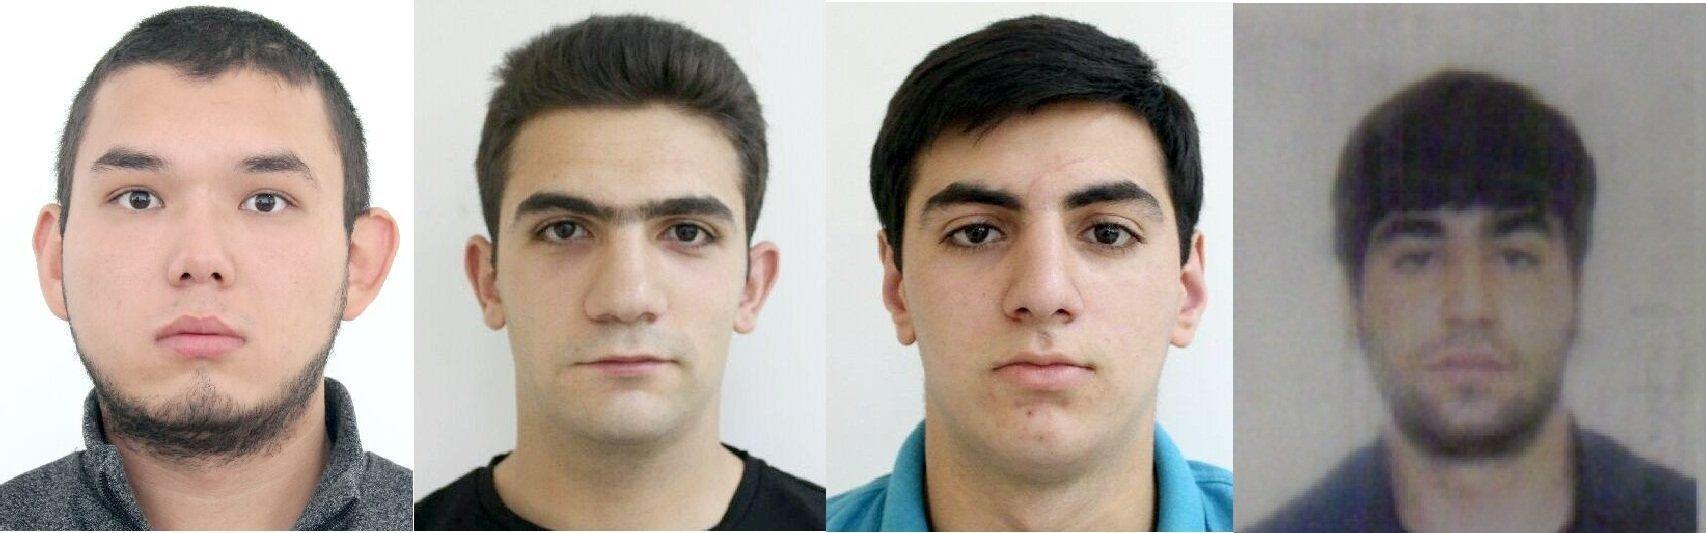 Нарек Гурурян Караганда убийство розыск